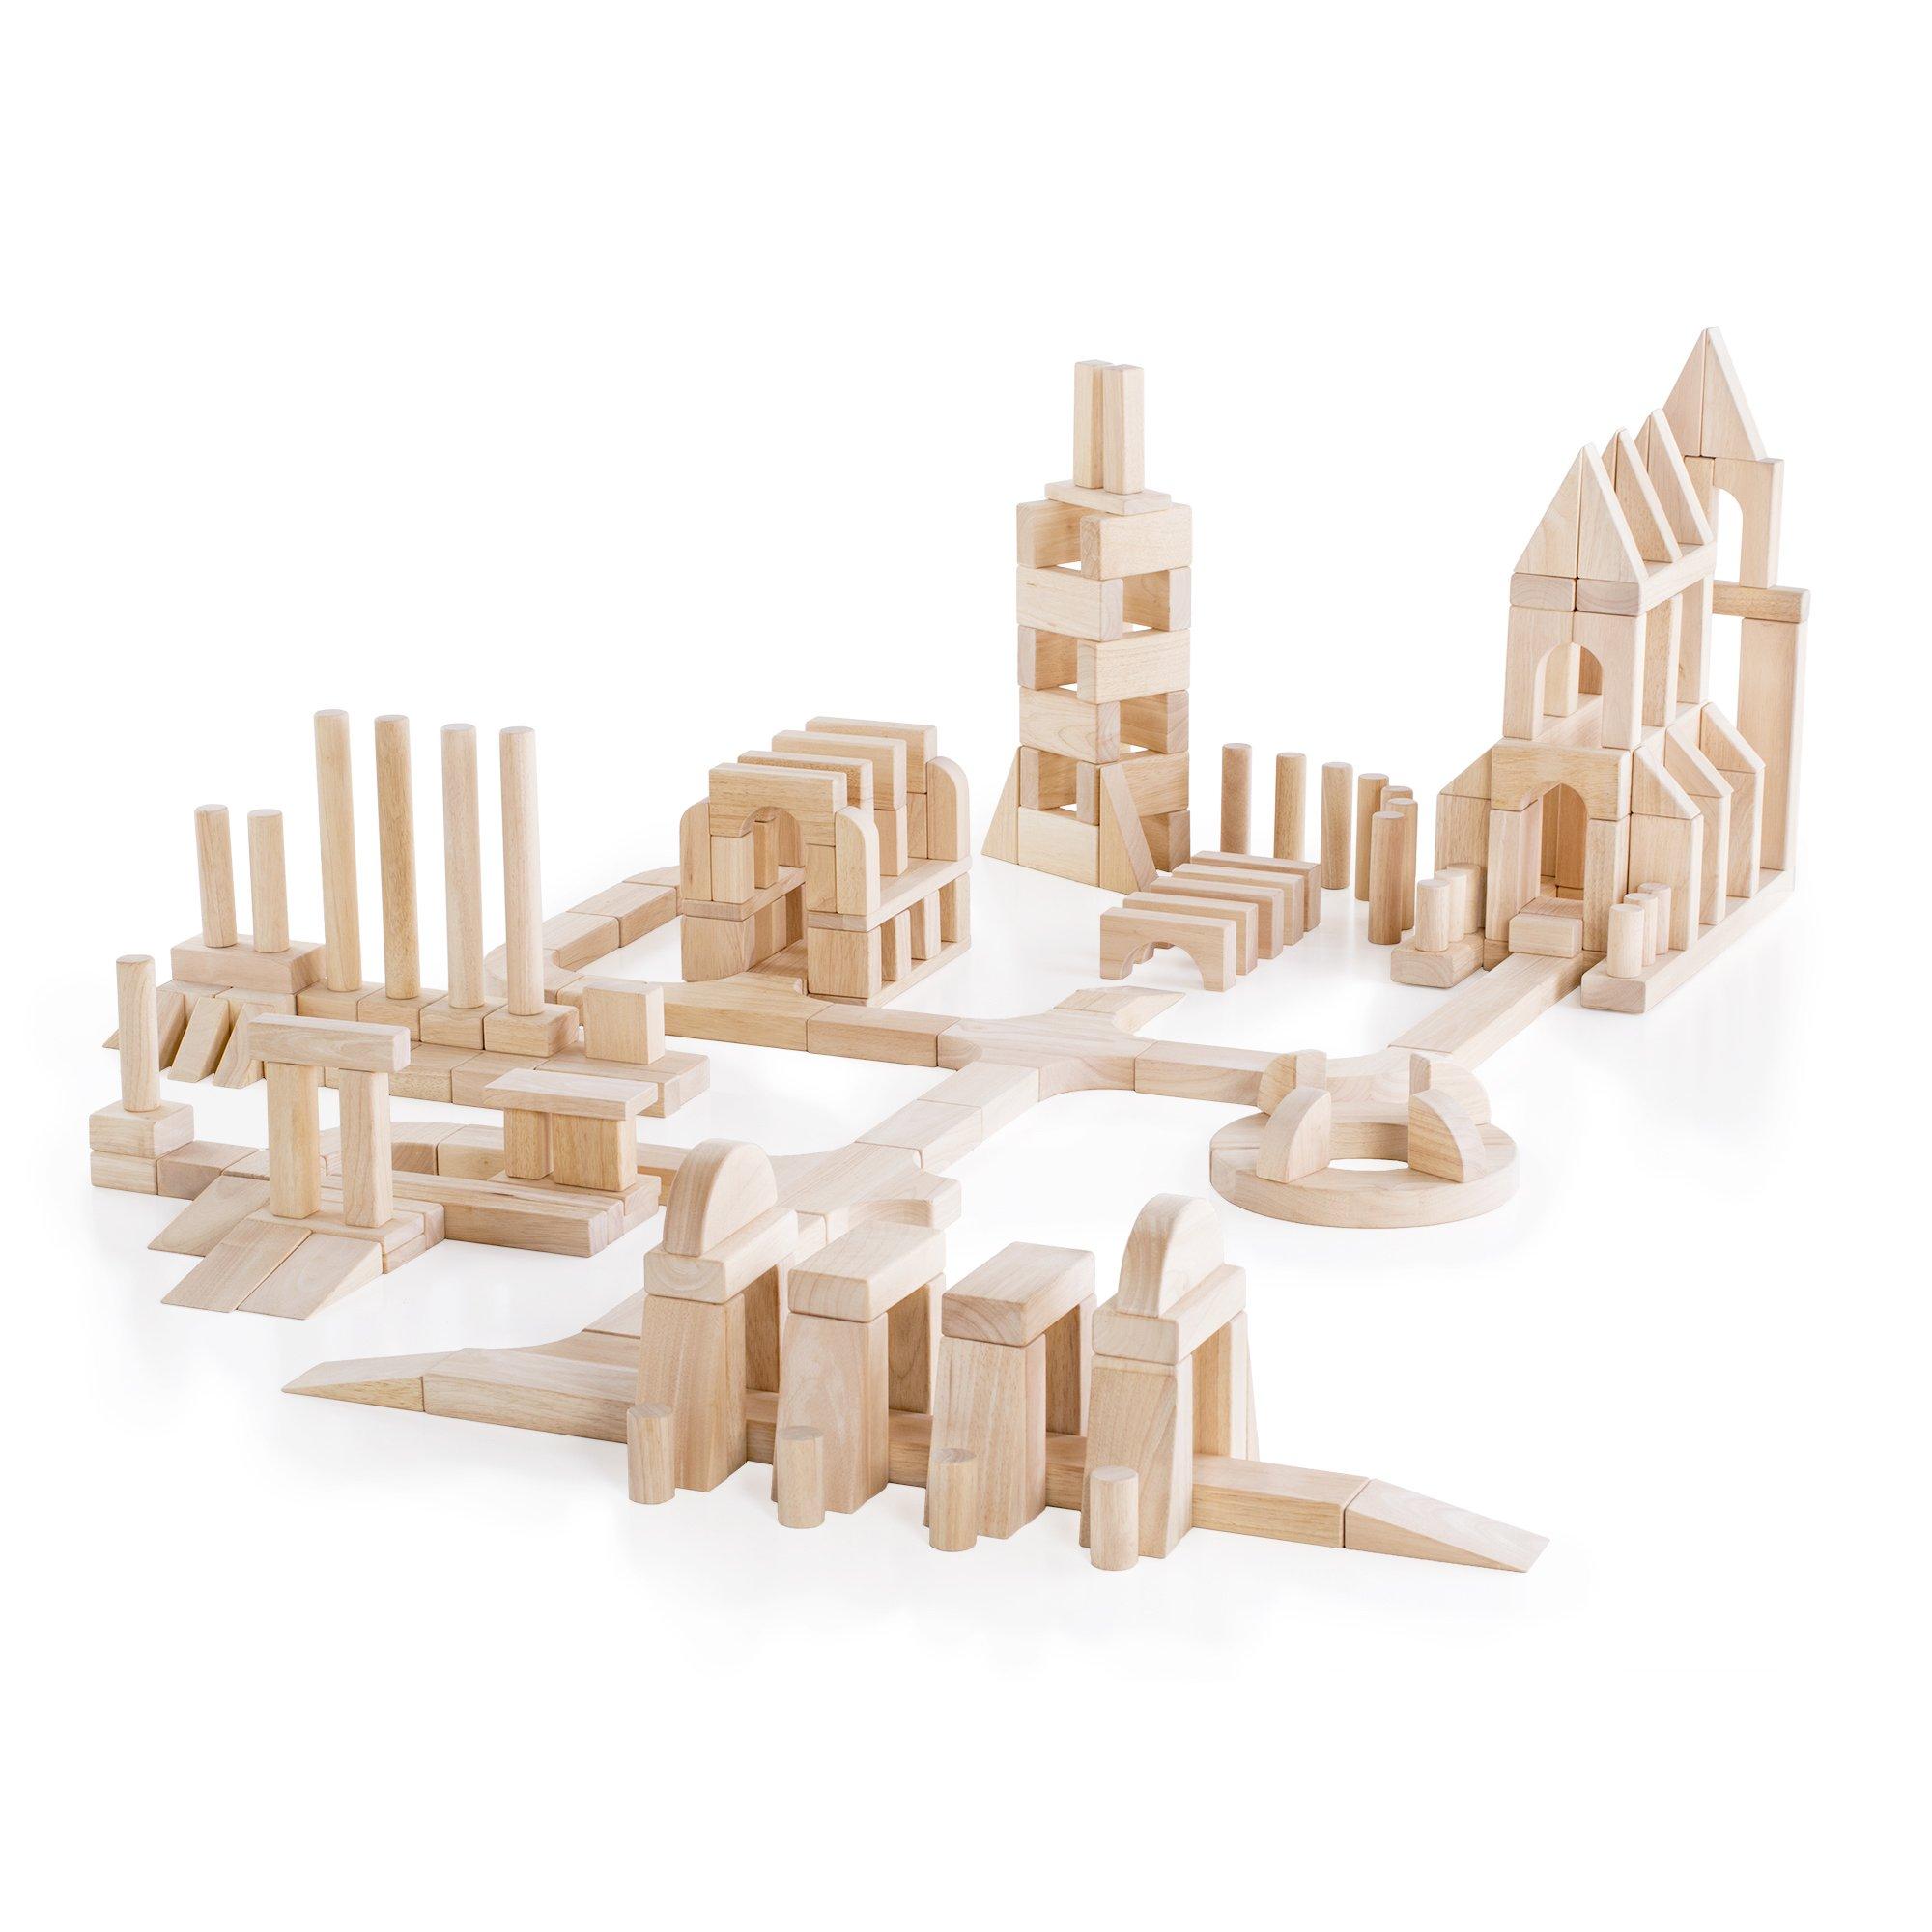 Guidecraft Unit Blocks Set E - 218 Piece Set - STEM Educational Toy for Kids